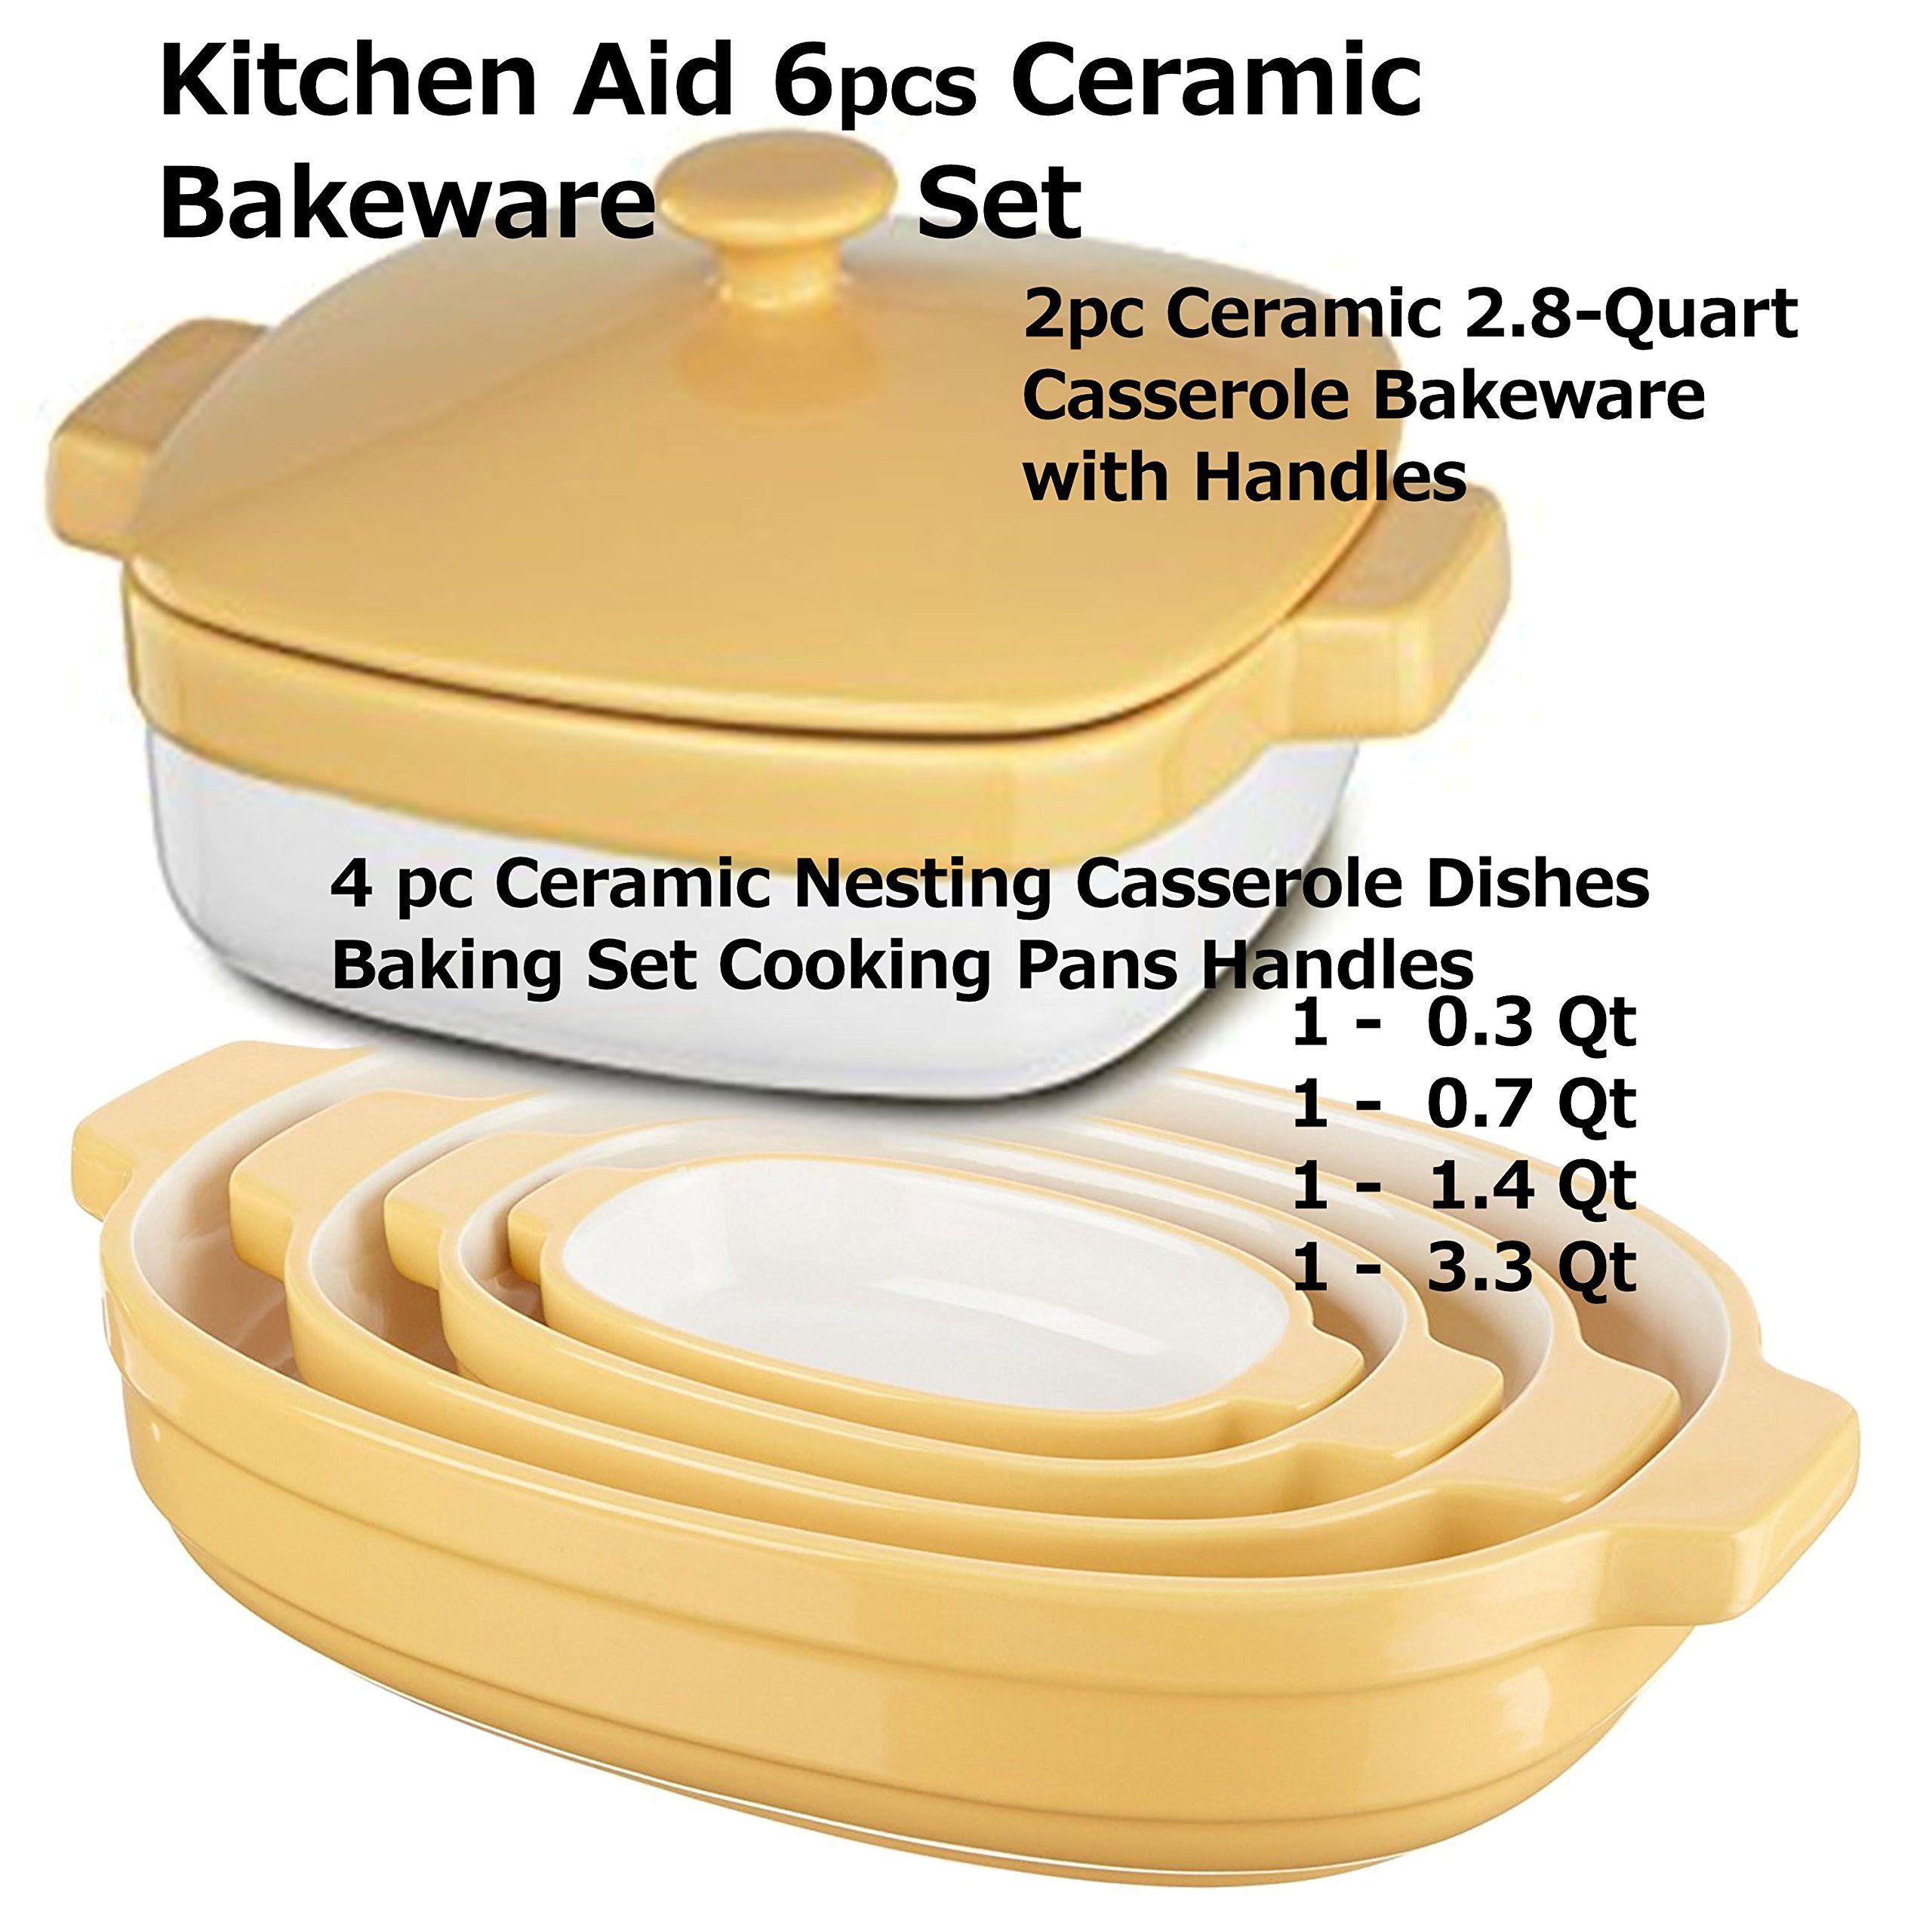 Kitchenaid 4pc Buttercup Ceramic Nesting Casserole Dishes Baking